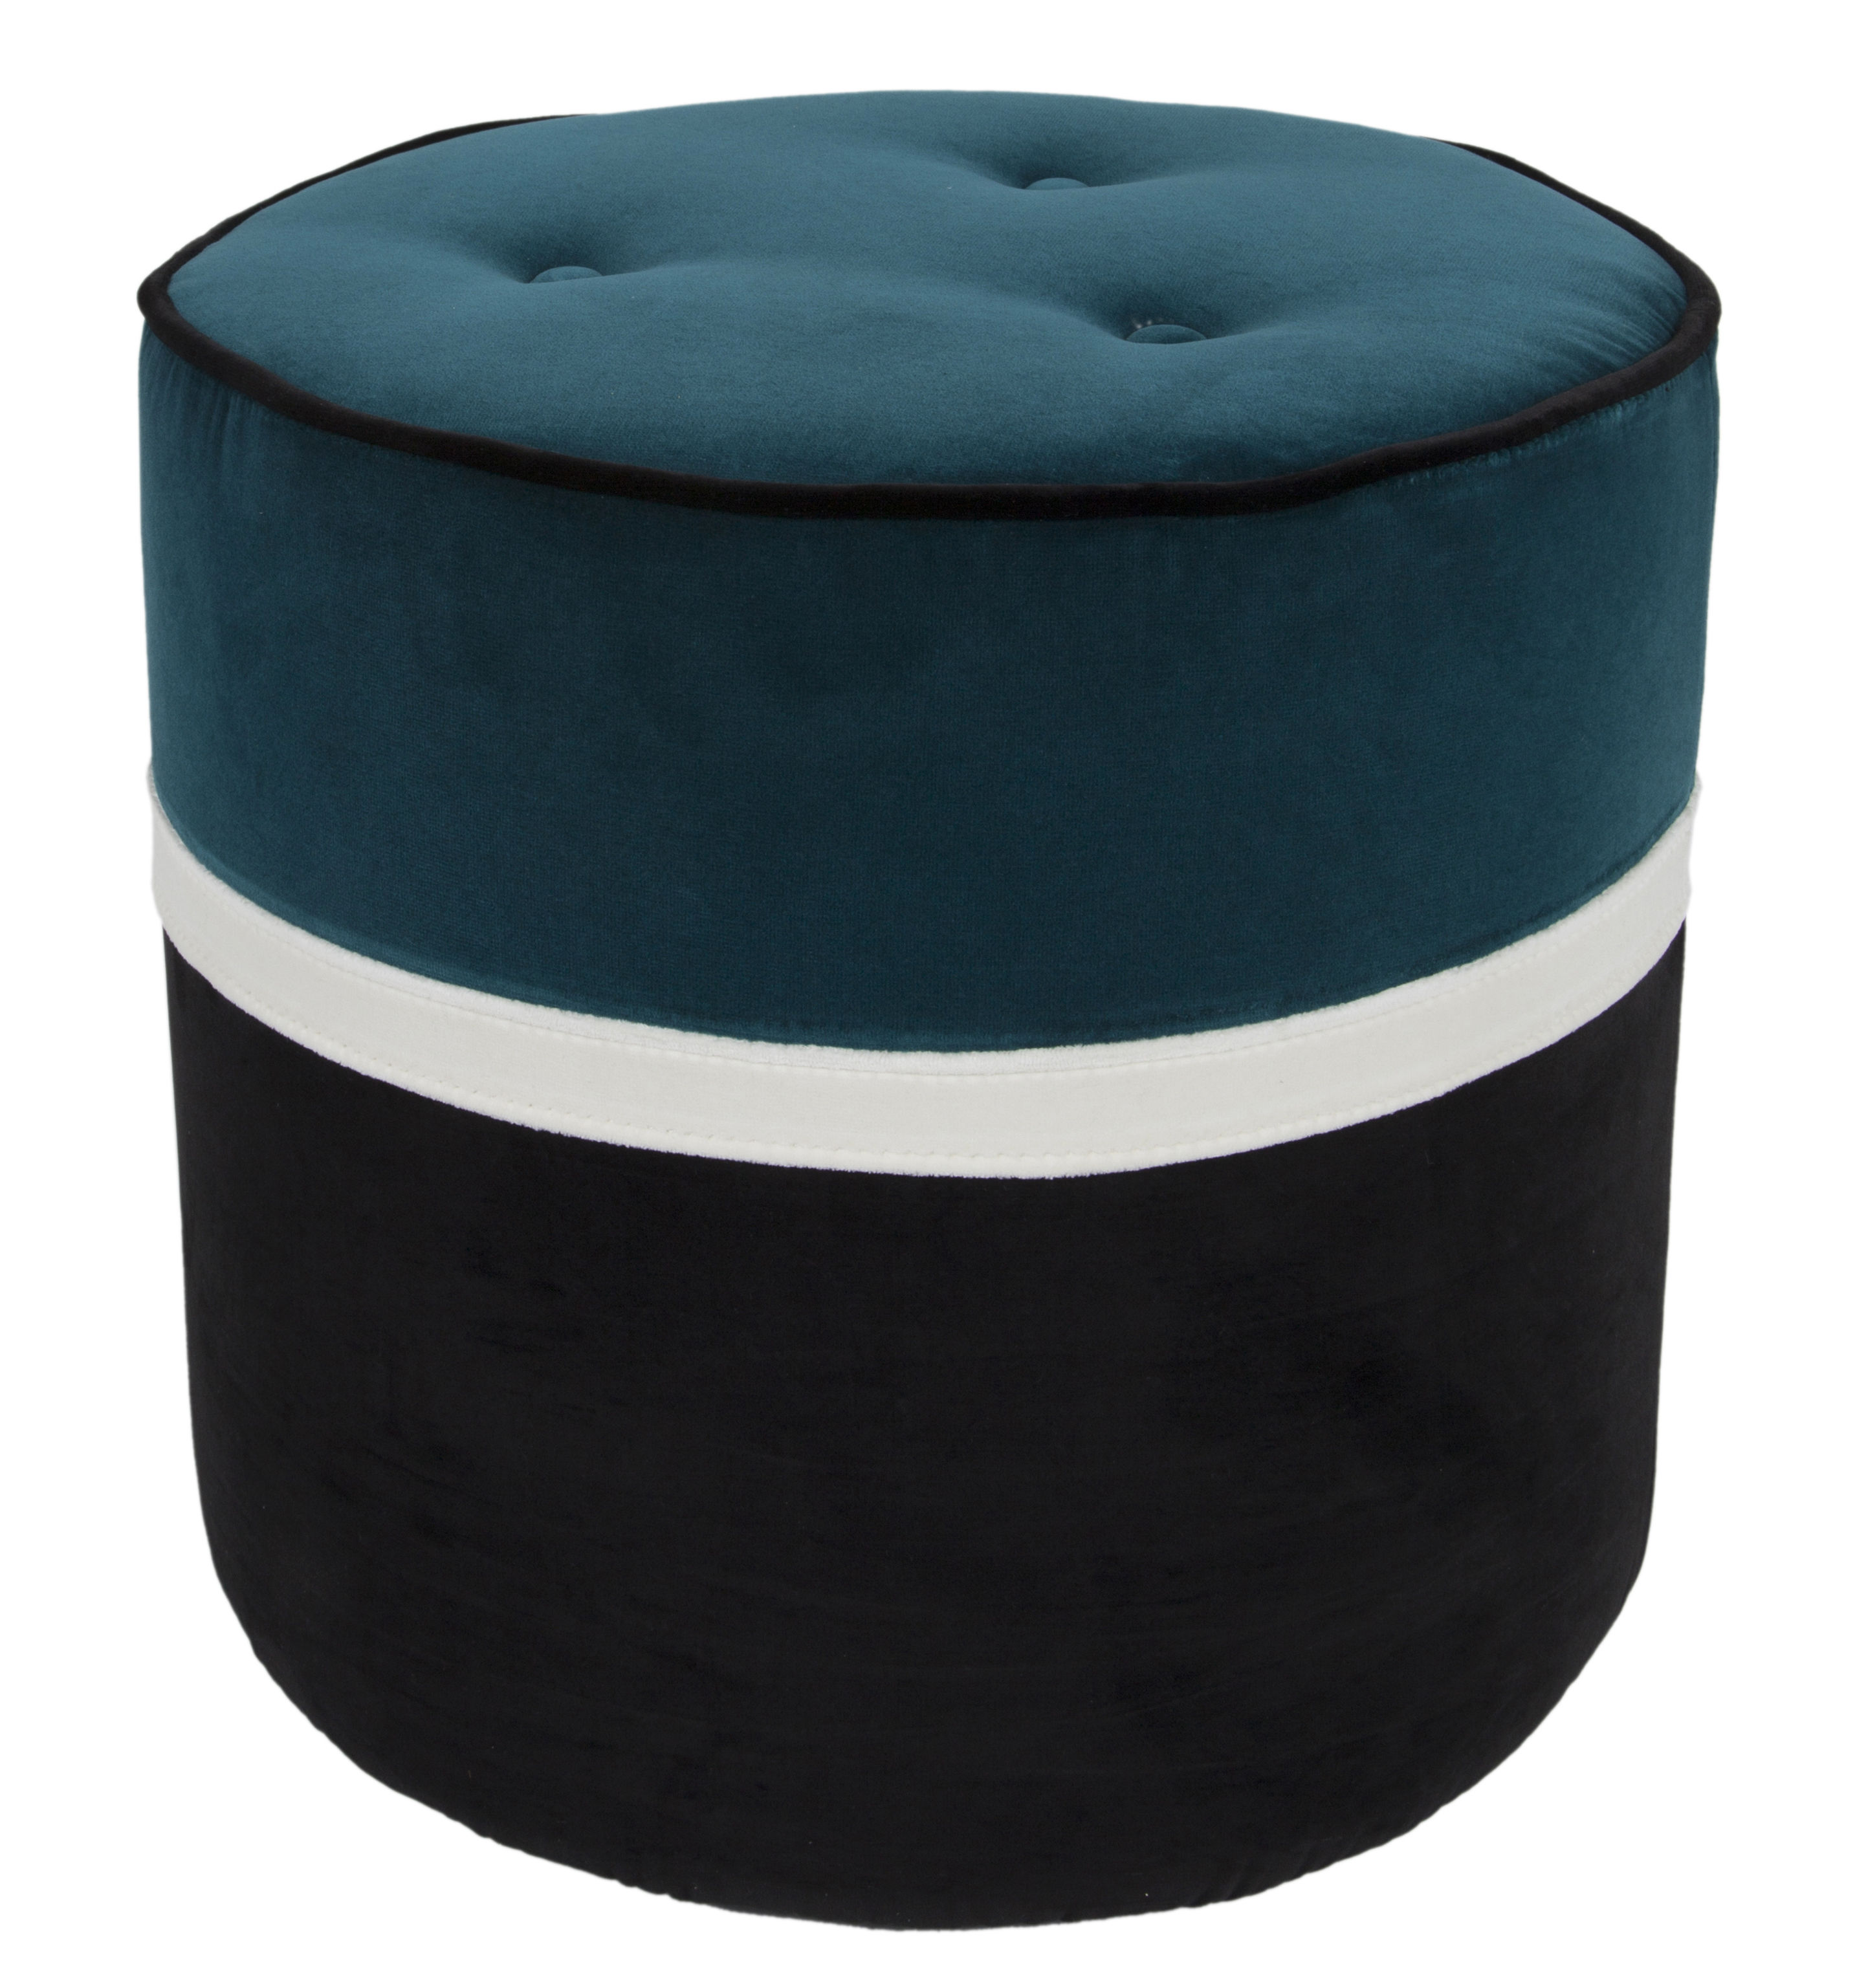 Furniture - Poufs & Floor Cushions - Léo Small Pouf - / Ø 42 x H 43 cm - Velvet by Maison Sarah Lavoine - Blue, Jasmine, Black - Foam, Velvet, Wood